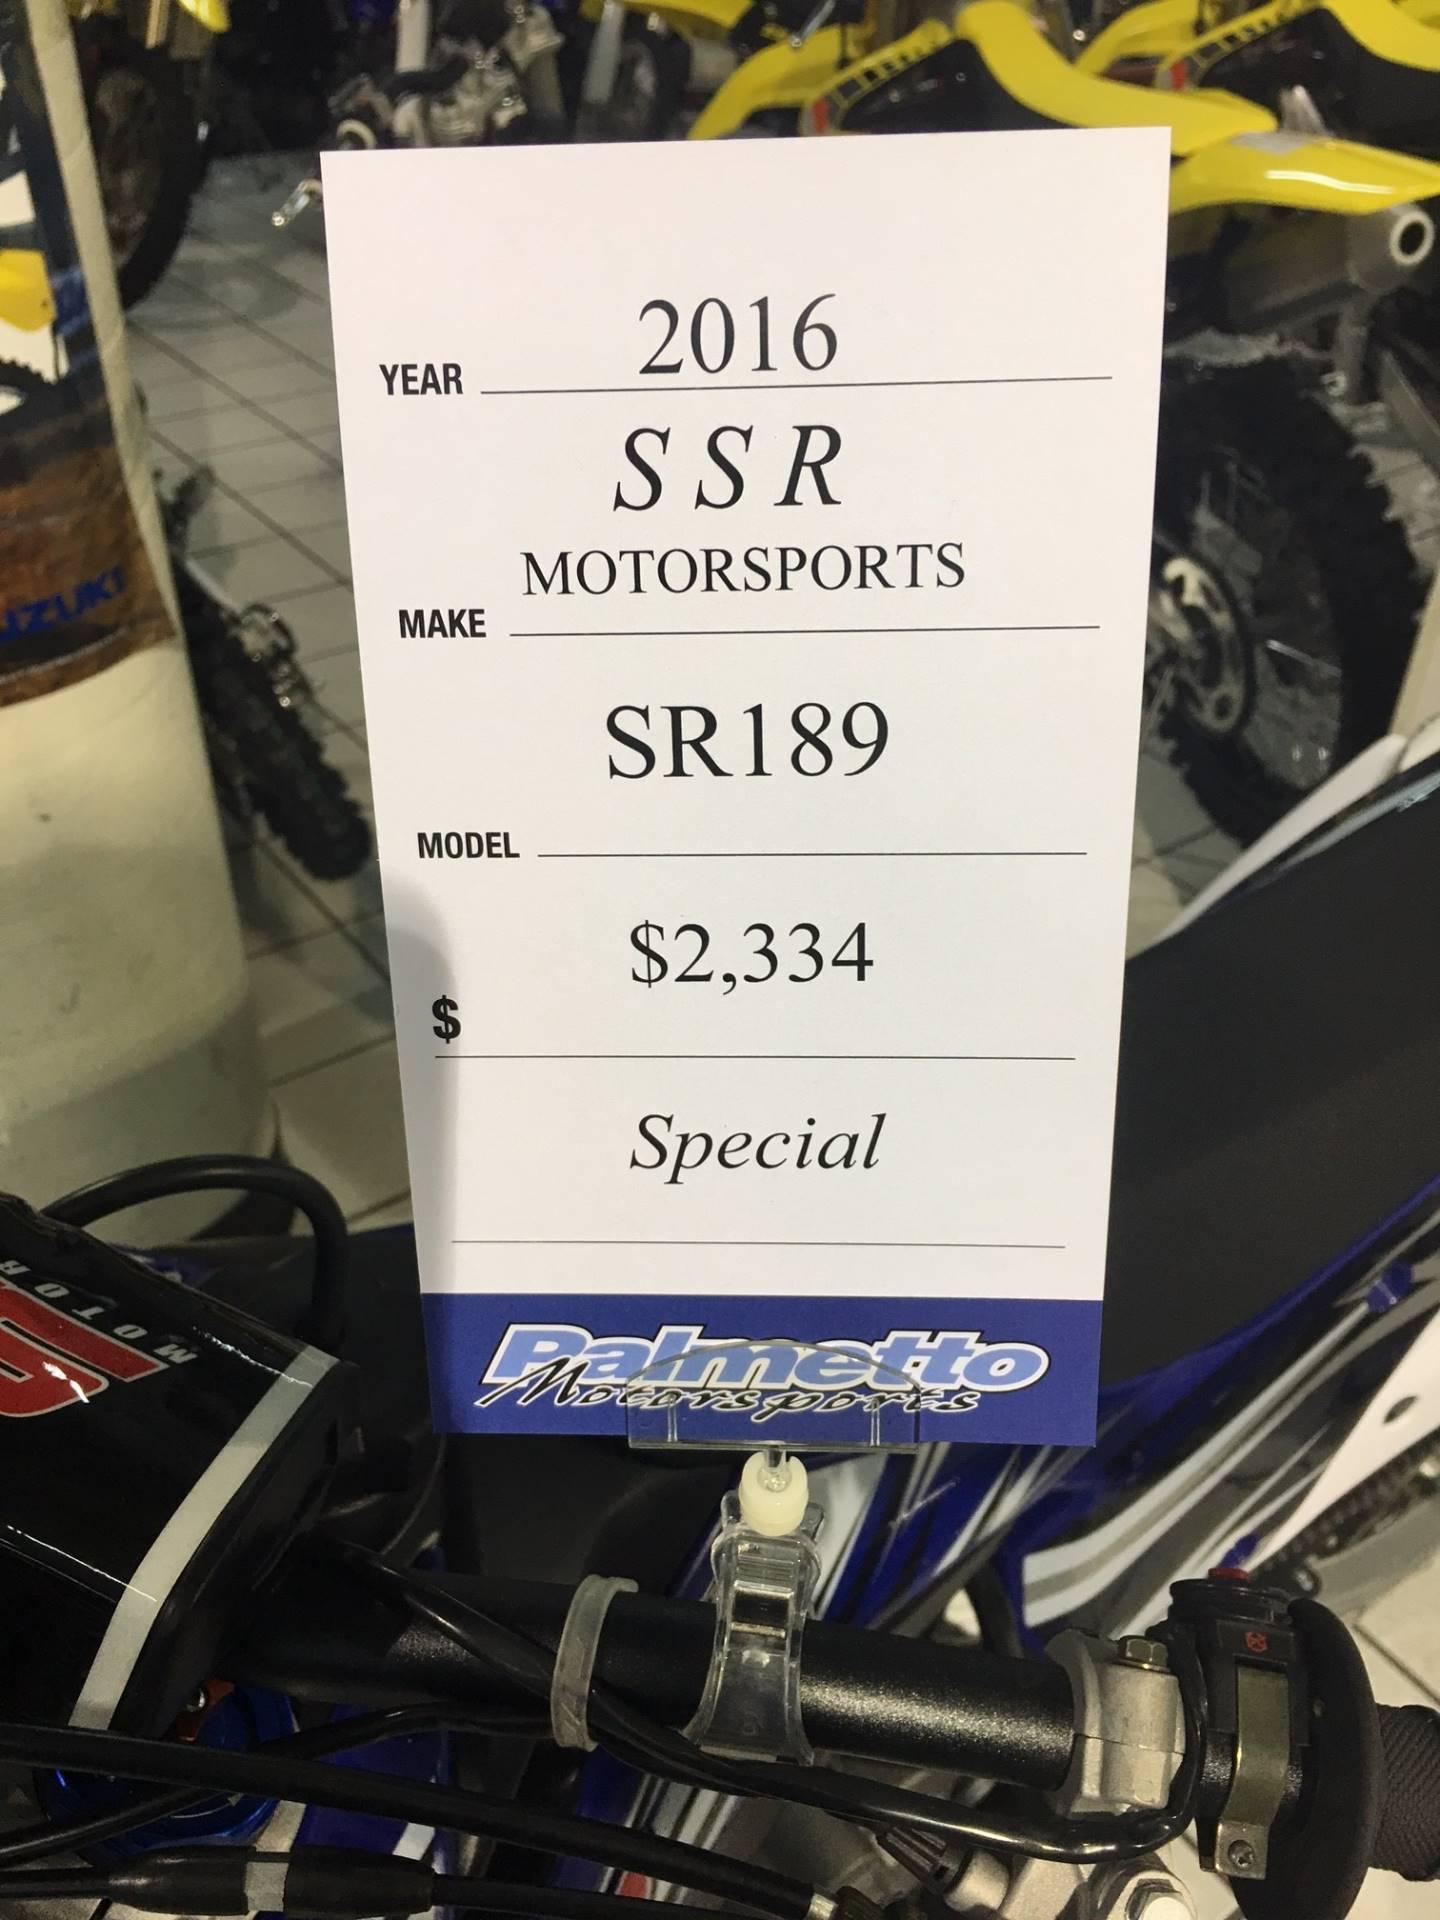 2016 SSR Motorsports SR189 in Hialeah, Florida